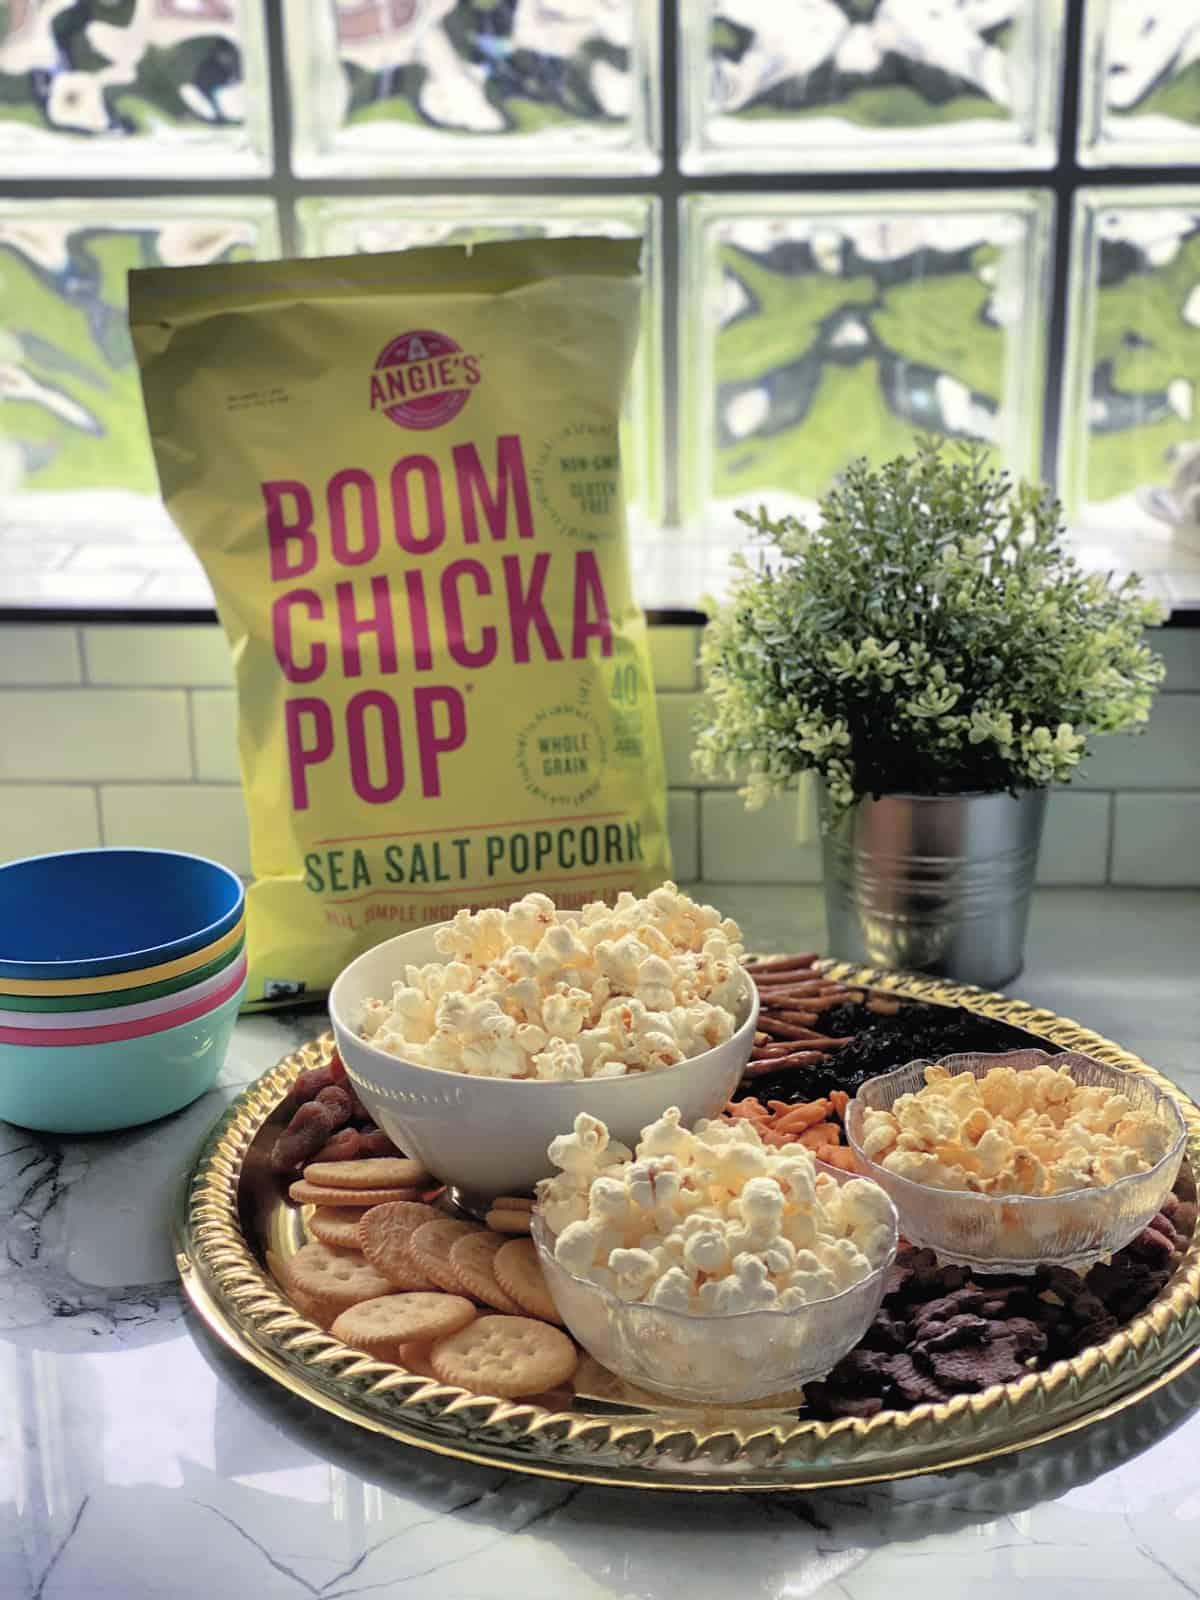 Family-Friendly Popcorn Snack Board with Angie's BOOMCHICKAPOP® popcorn.